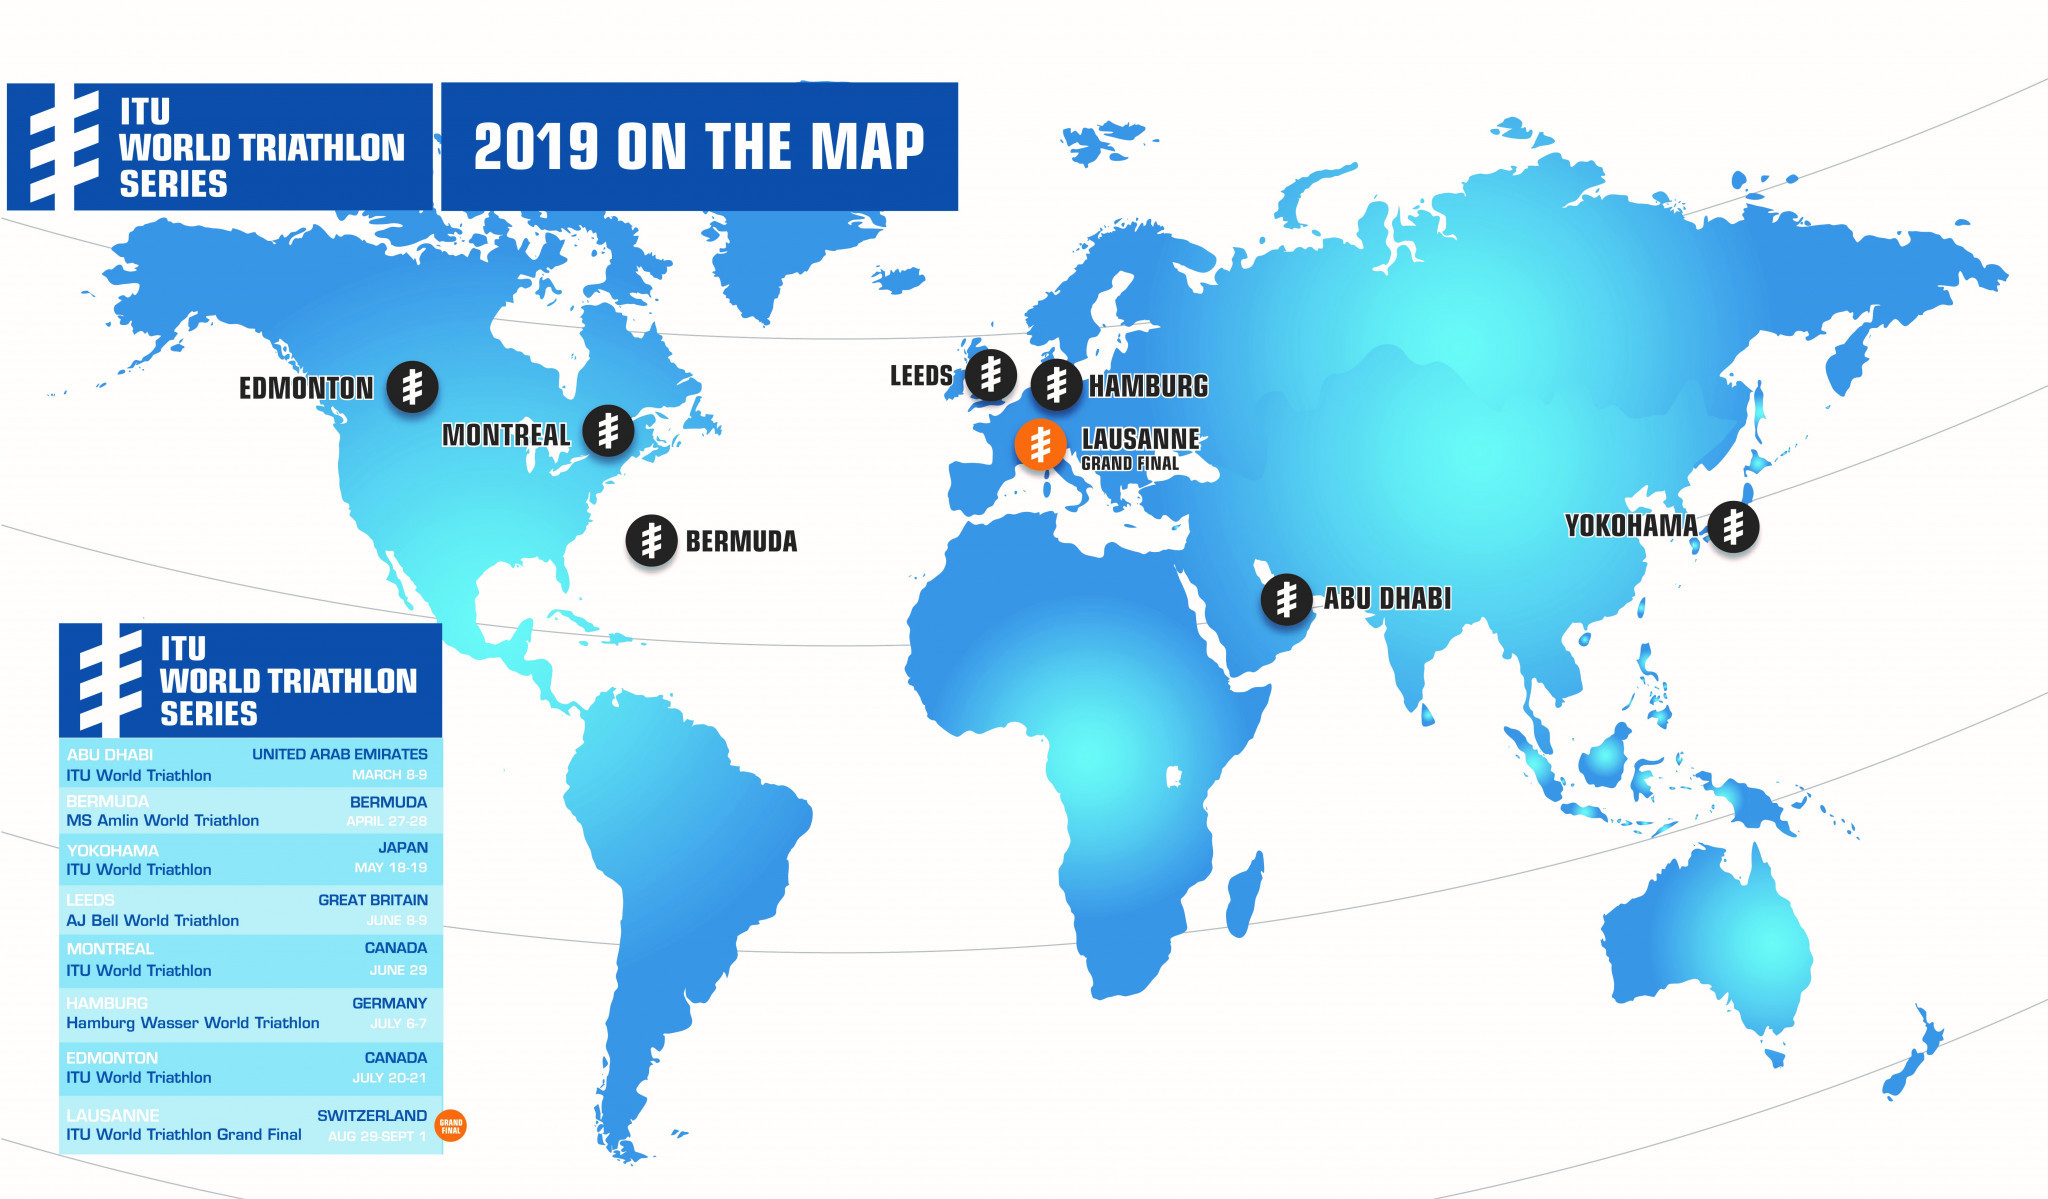 ITU announces calendar for 2019 World Triathlon Series